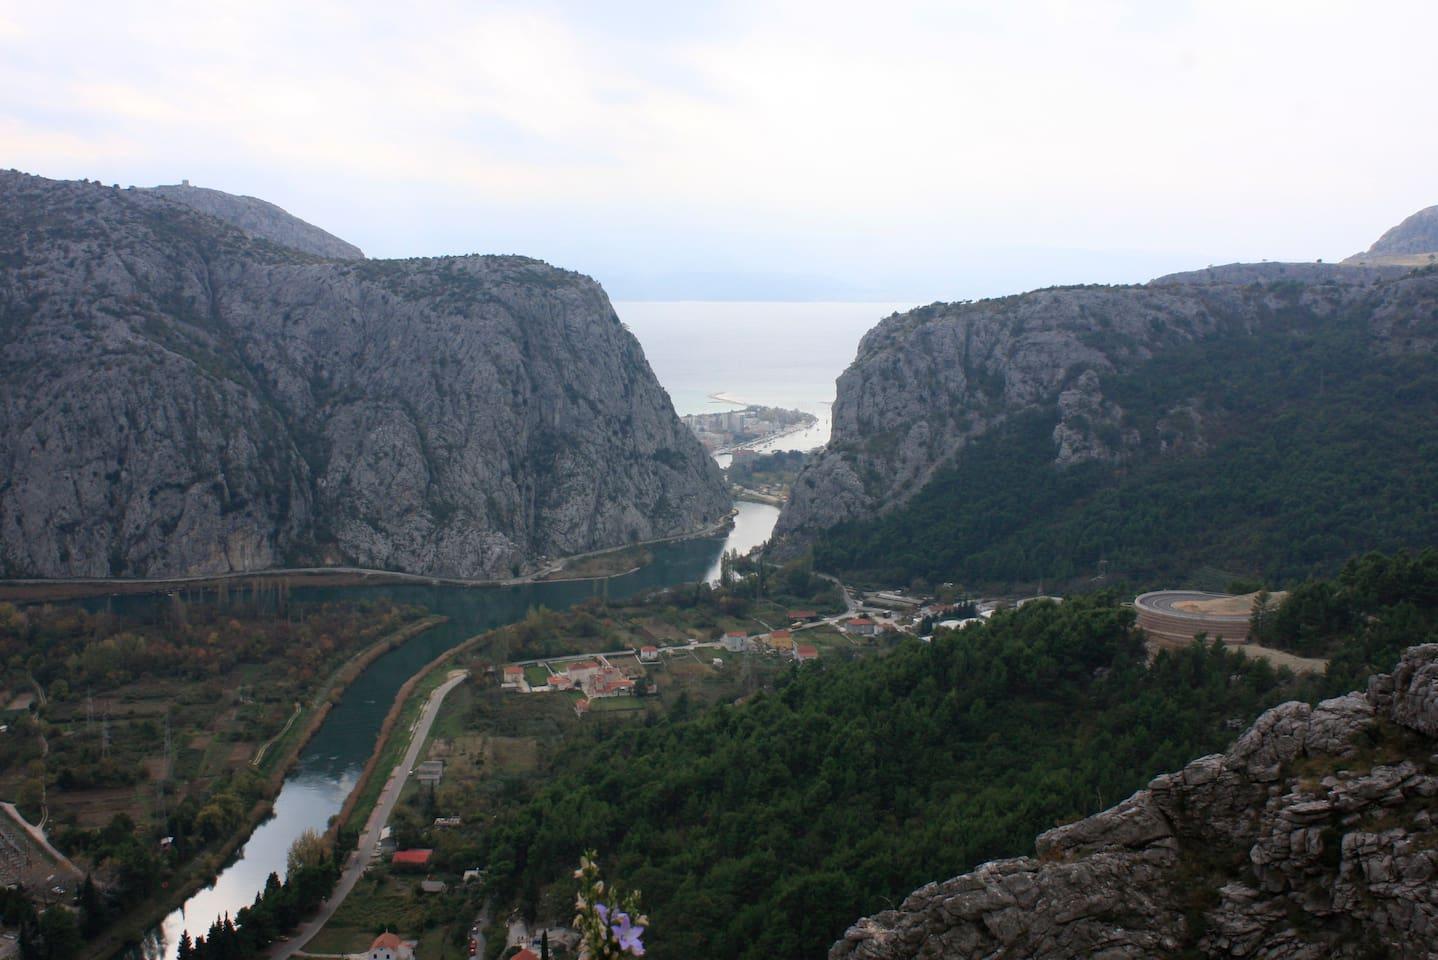 Canyon of river Cetina